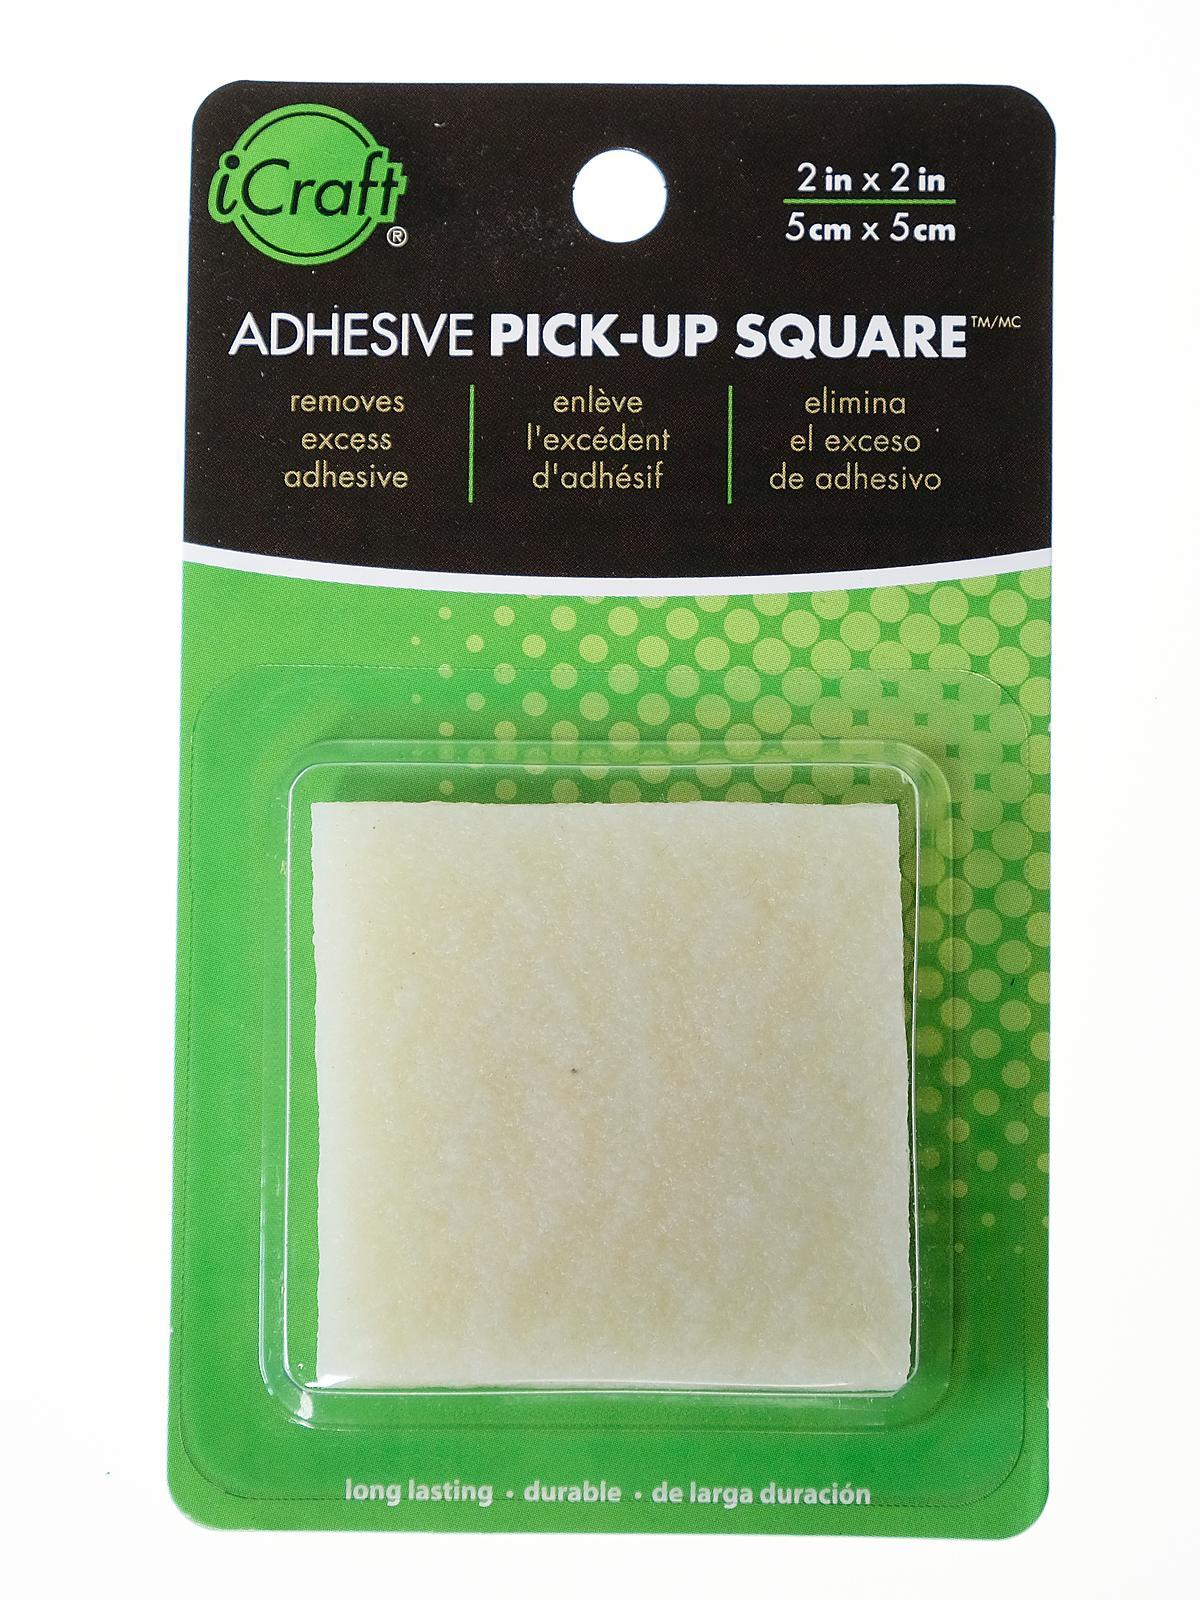 Adhesive Pick-Up Square